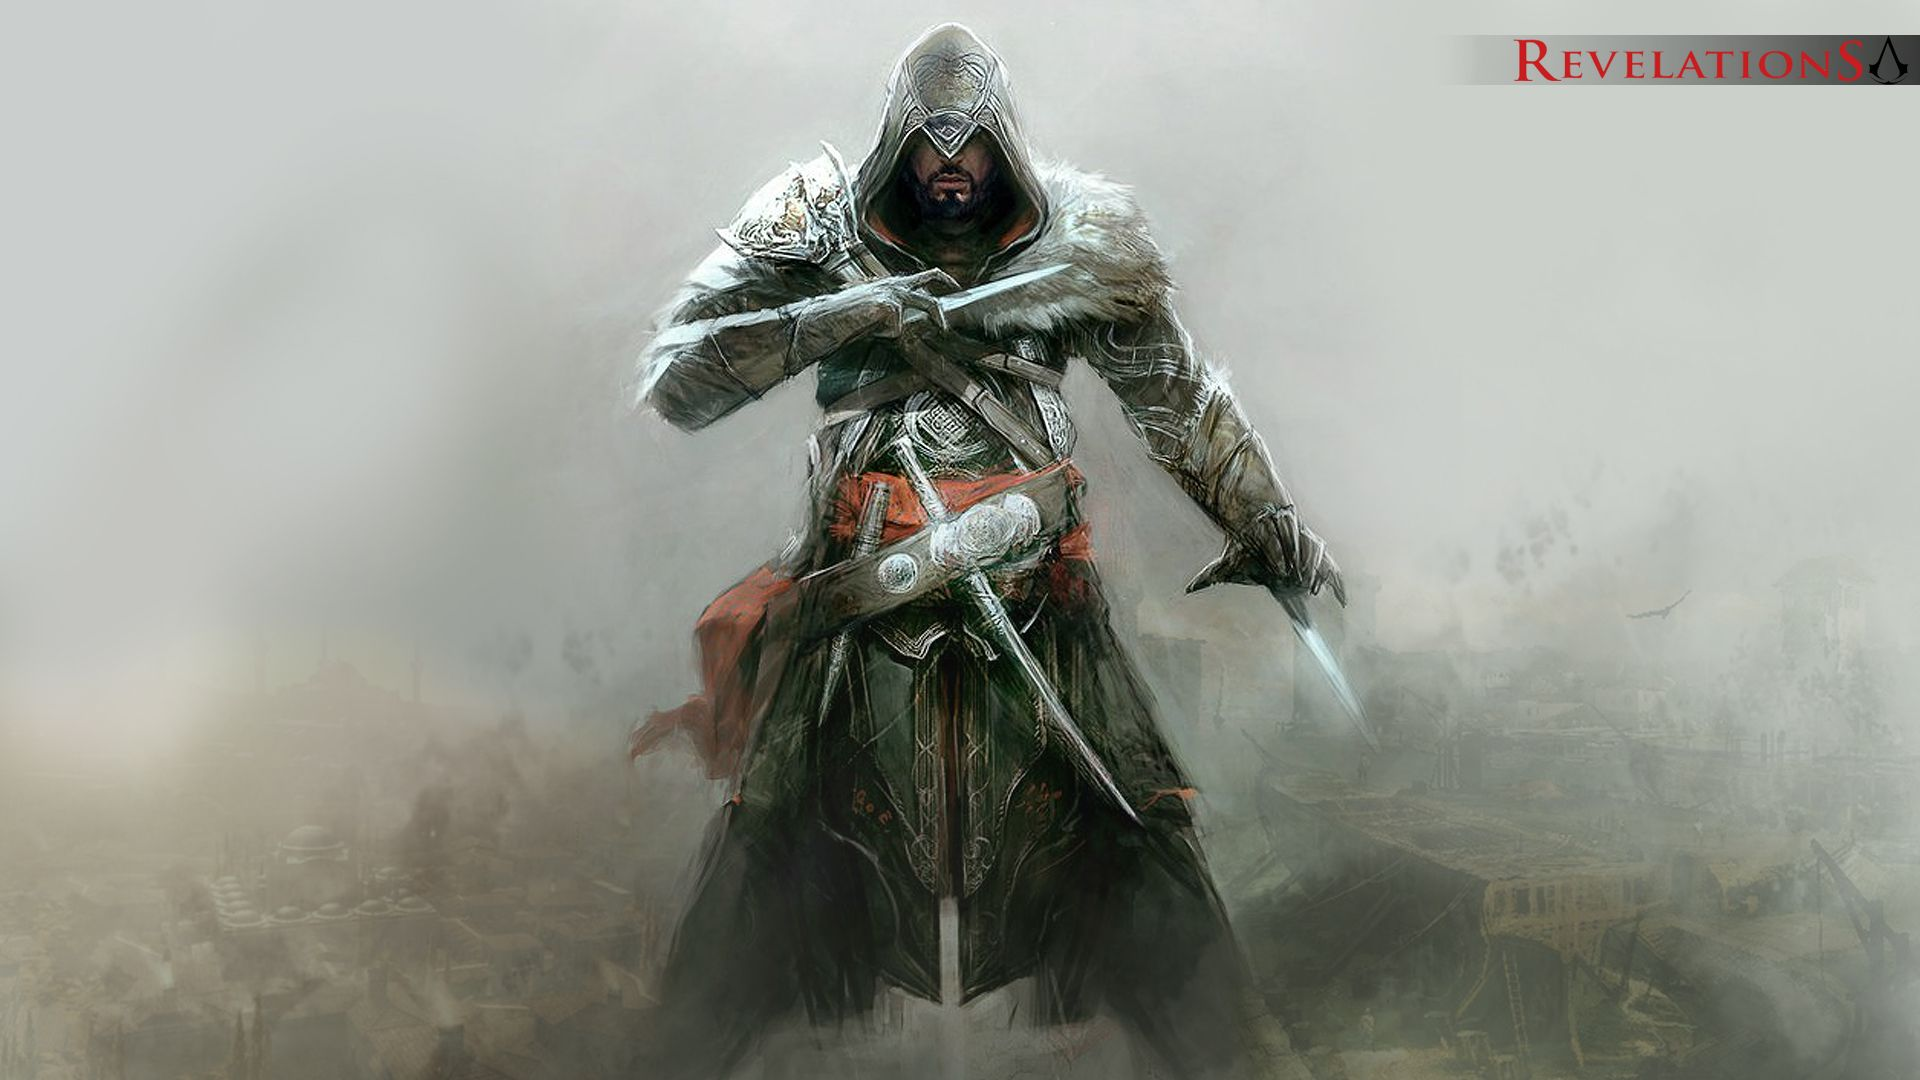 Assassin s Creed Revelations assassins creed 23439796 1920 1080jpg 1920x1080